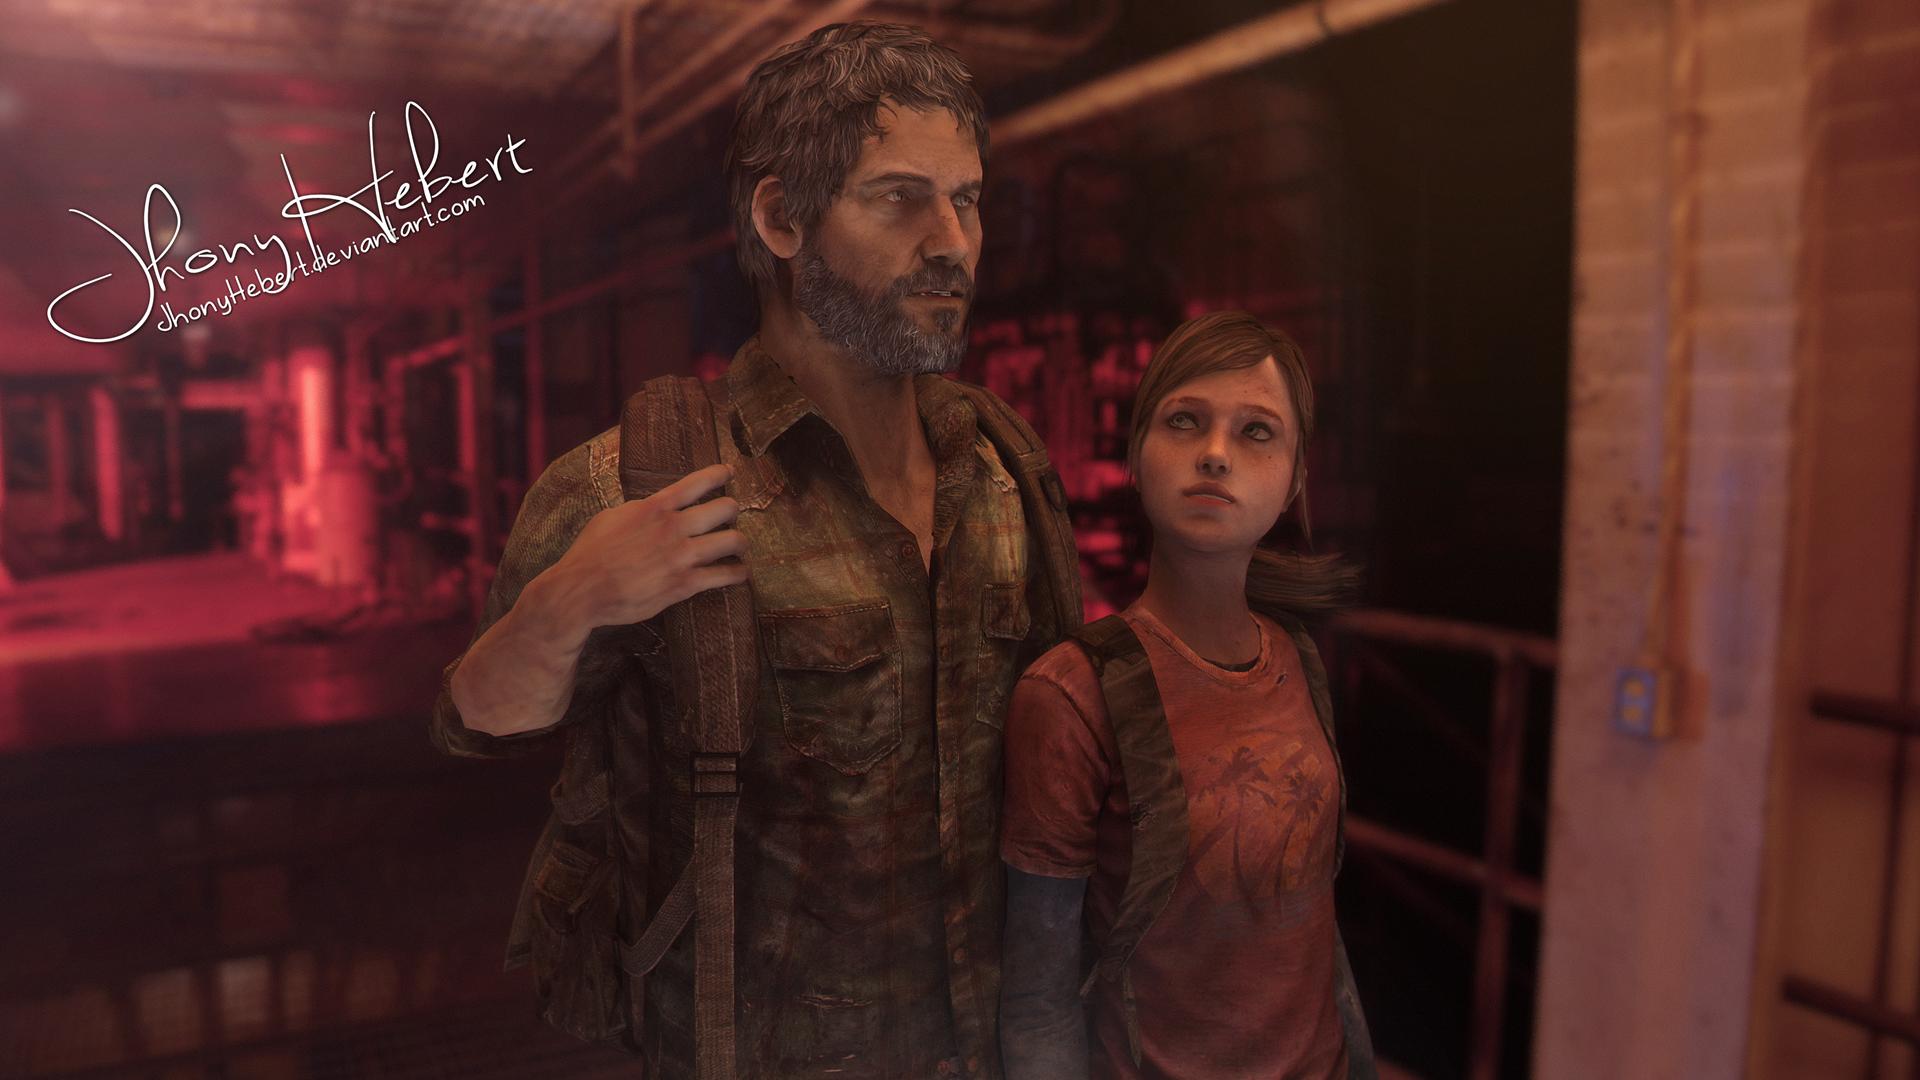 Ellie and Joel - The Last of Us by JhonyHebert on DeviantArt